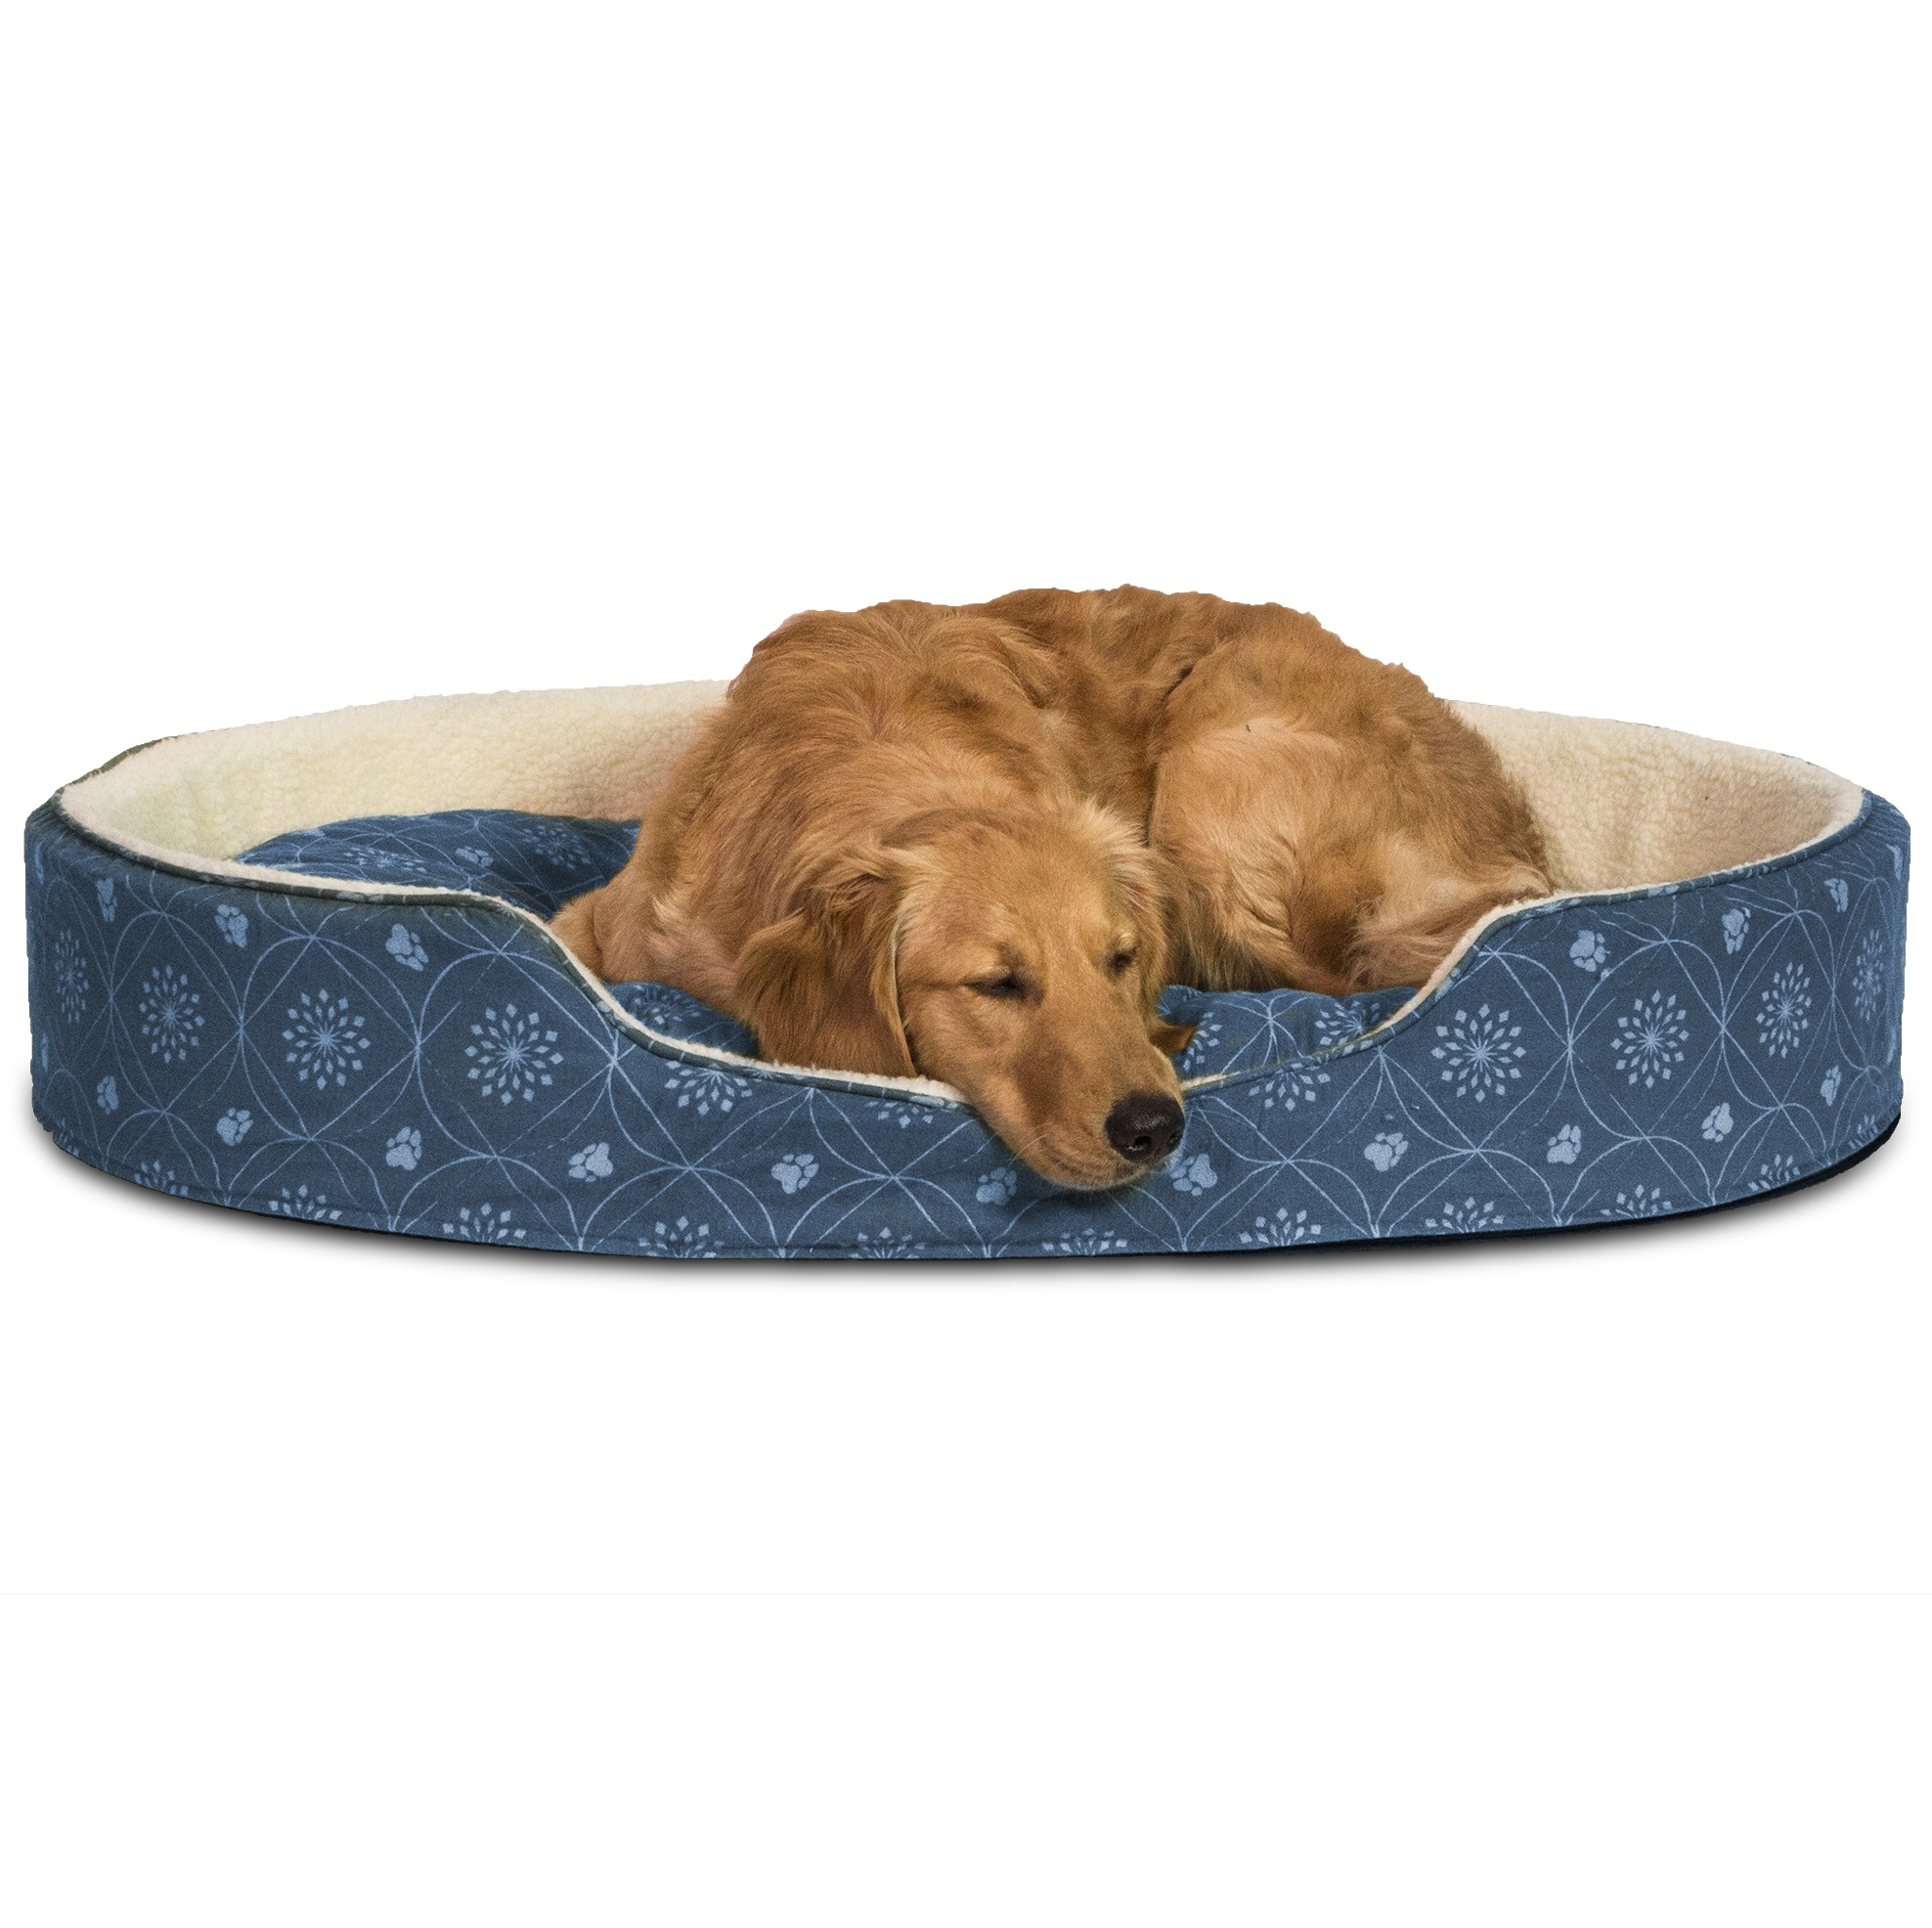 Serta Jumbo Dog Bed